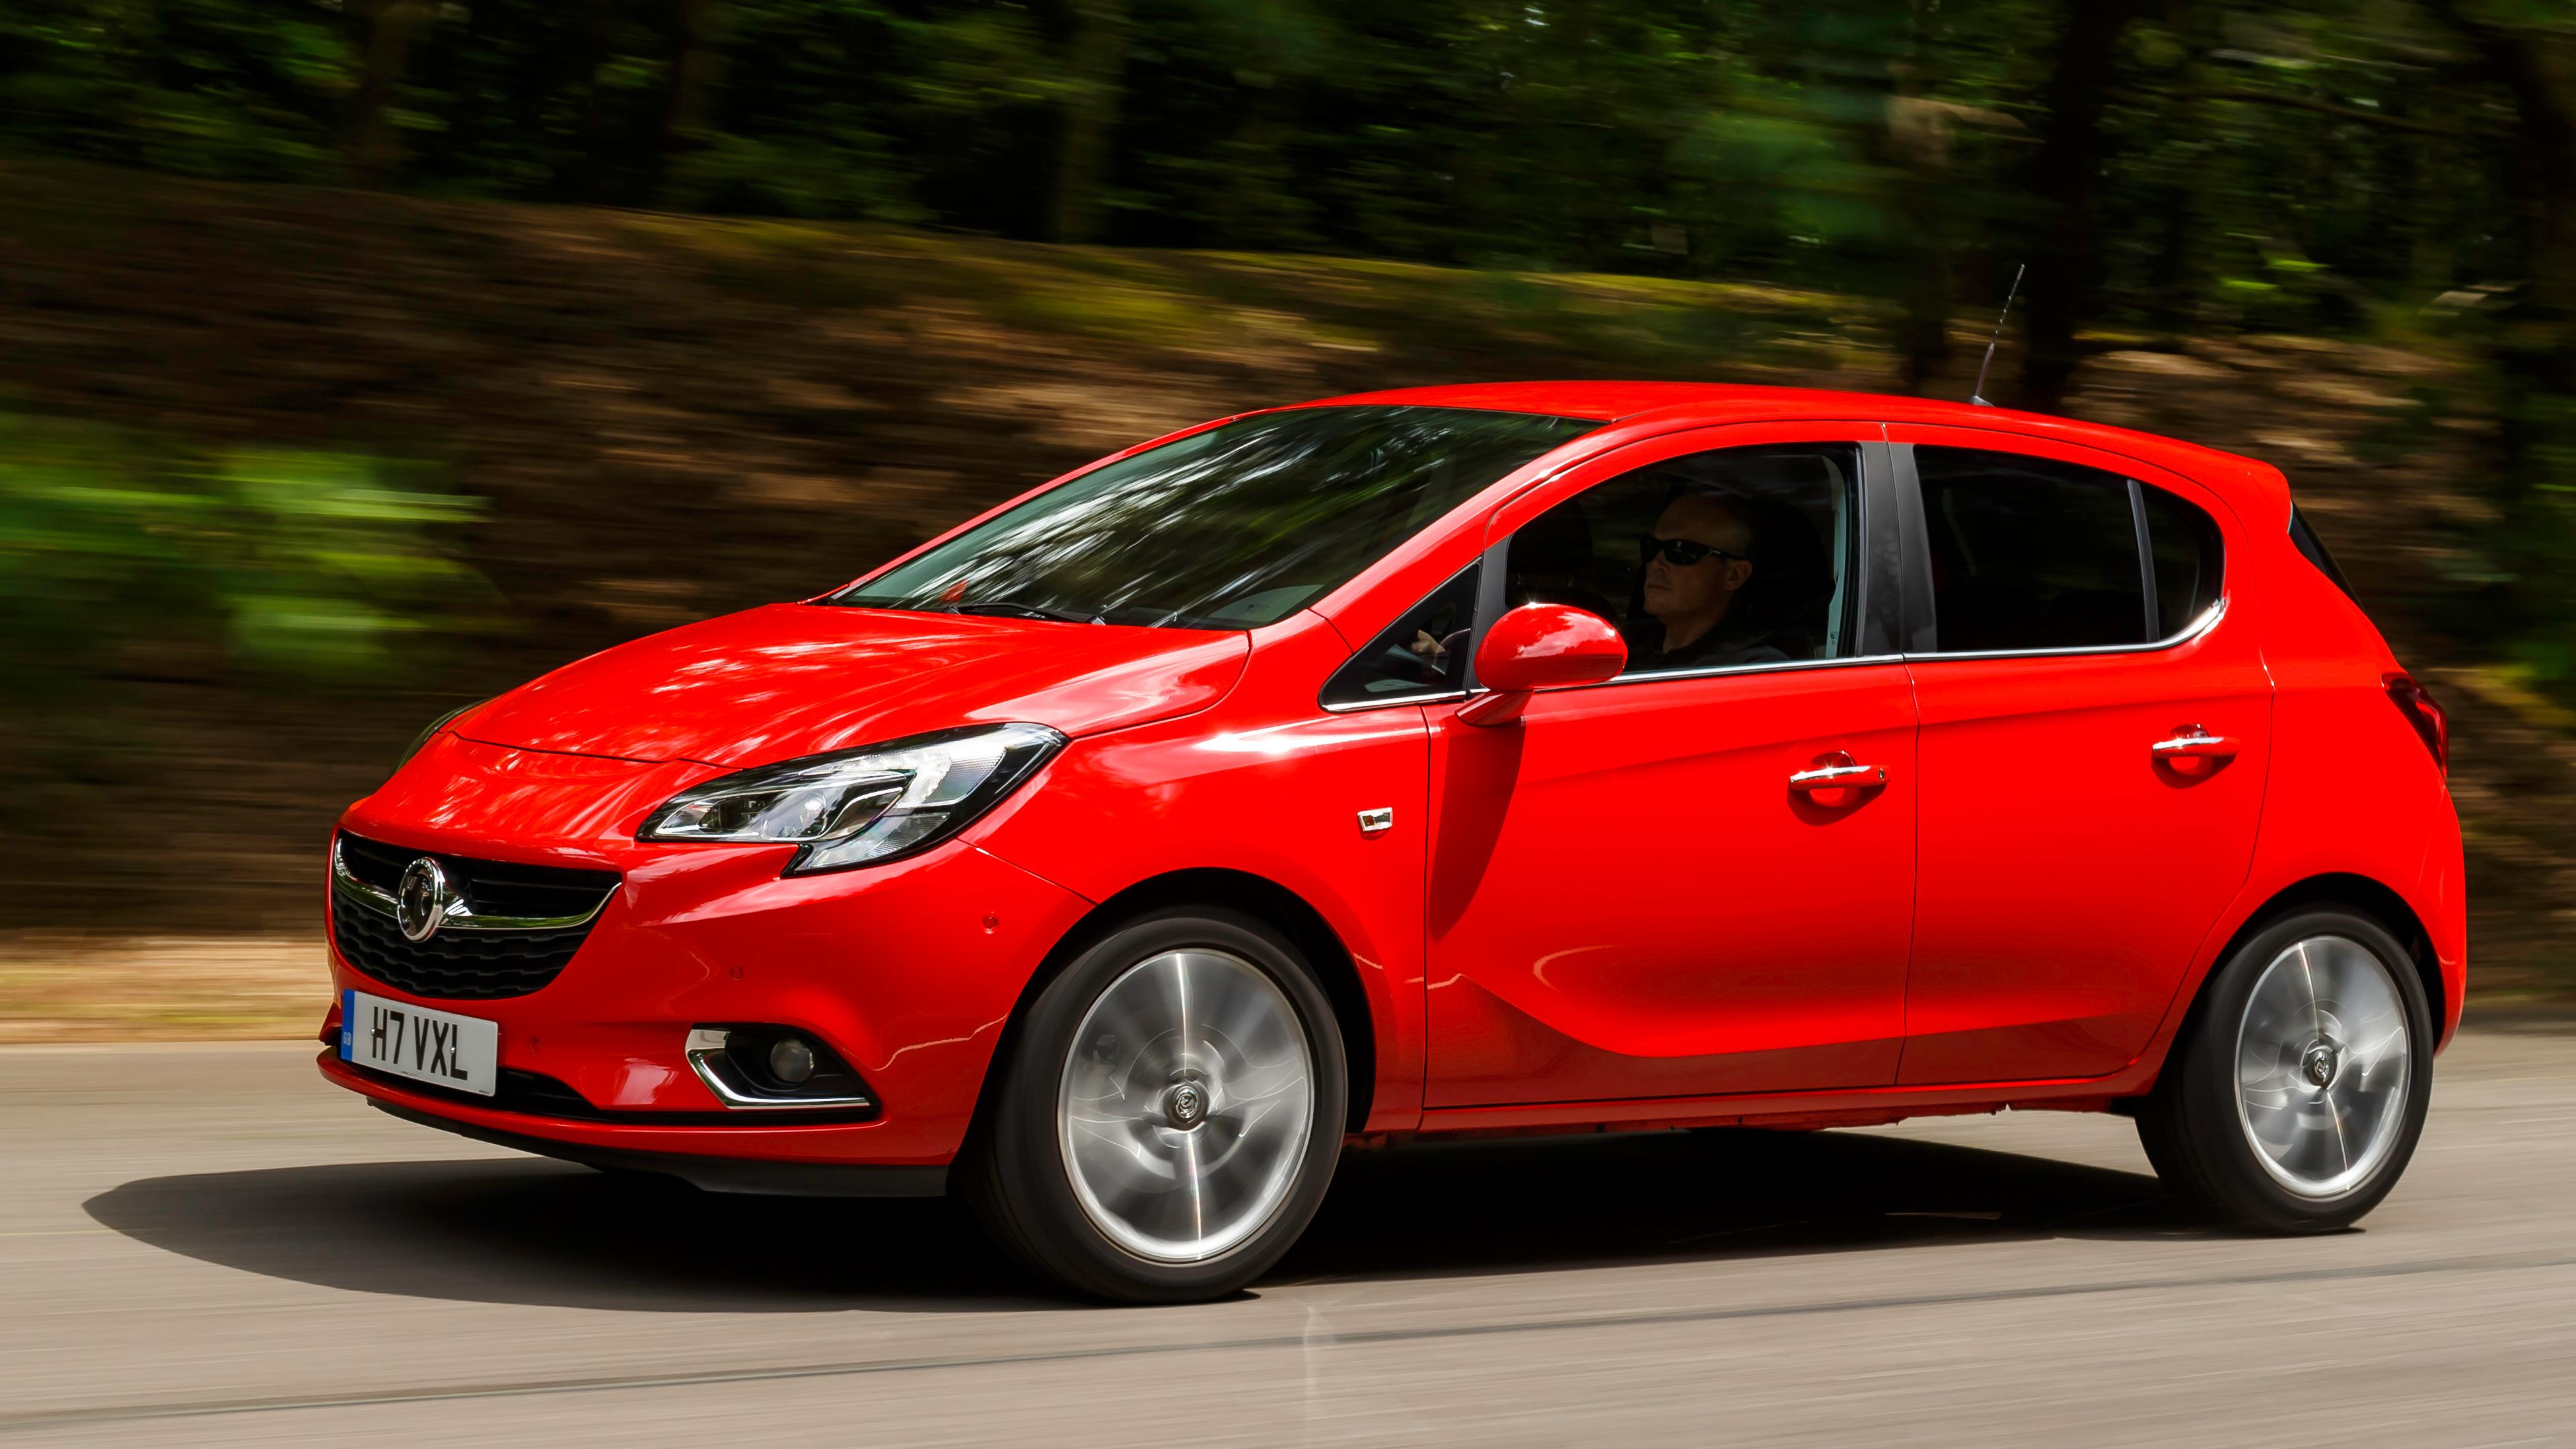 Vauxhall/Opel Corsa – fourth-gen supermini unveiled Image 257656